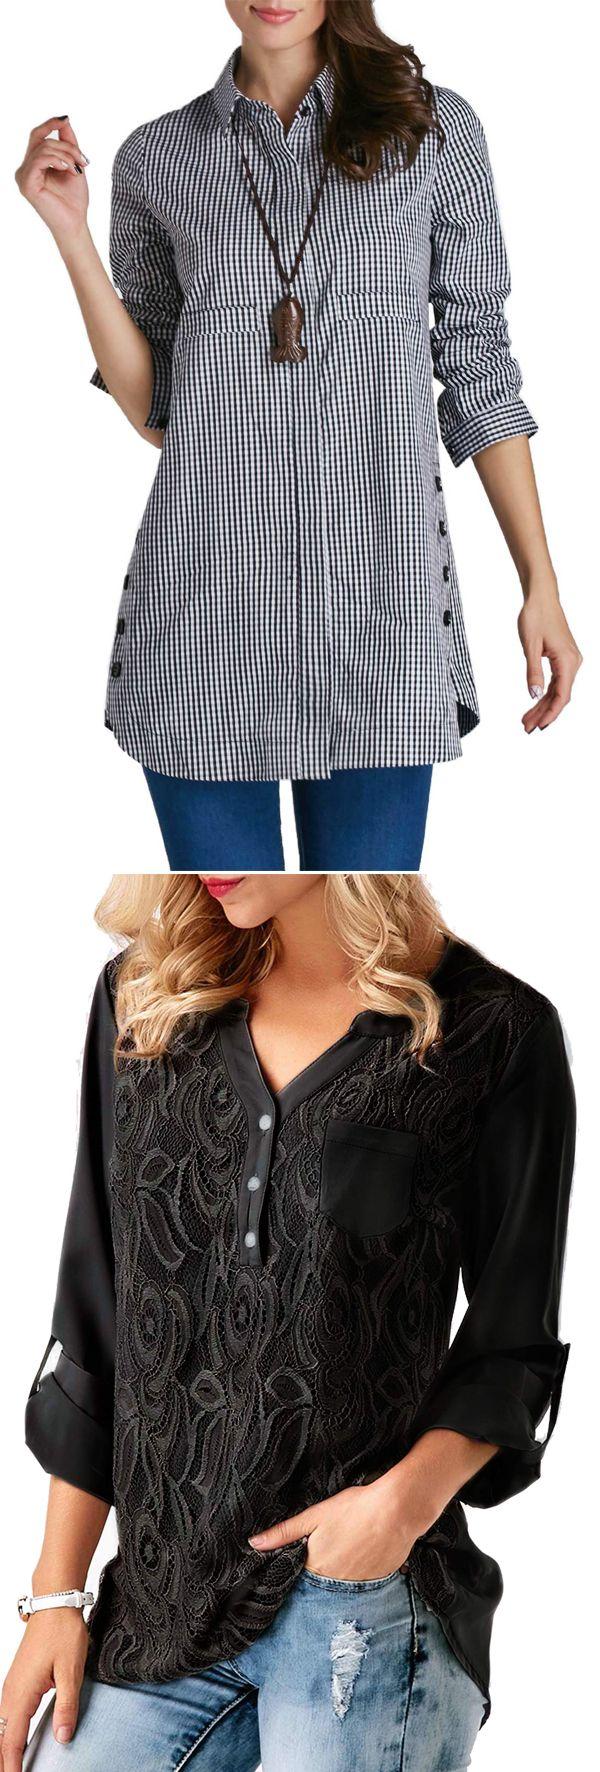 trendy tops for women, trendy blouses for women, fashion blouses, long sleeve blouses, fall blouses, blouse for fall